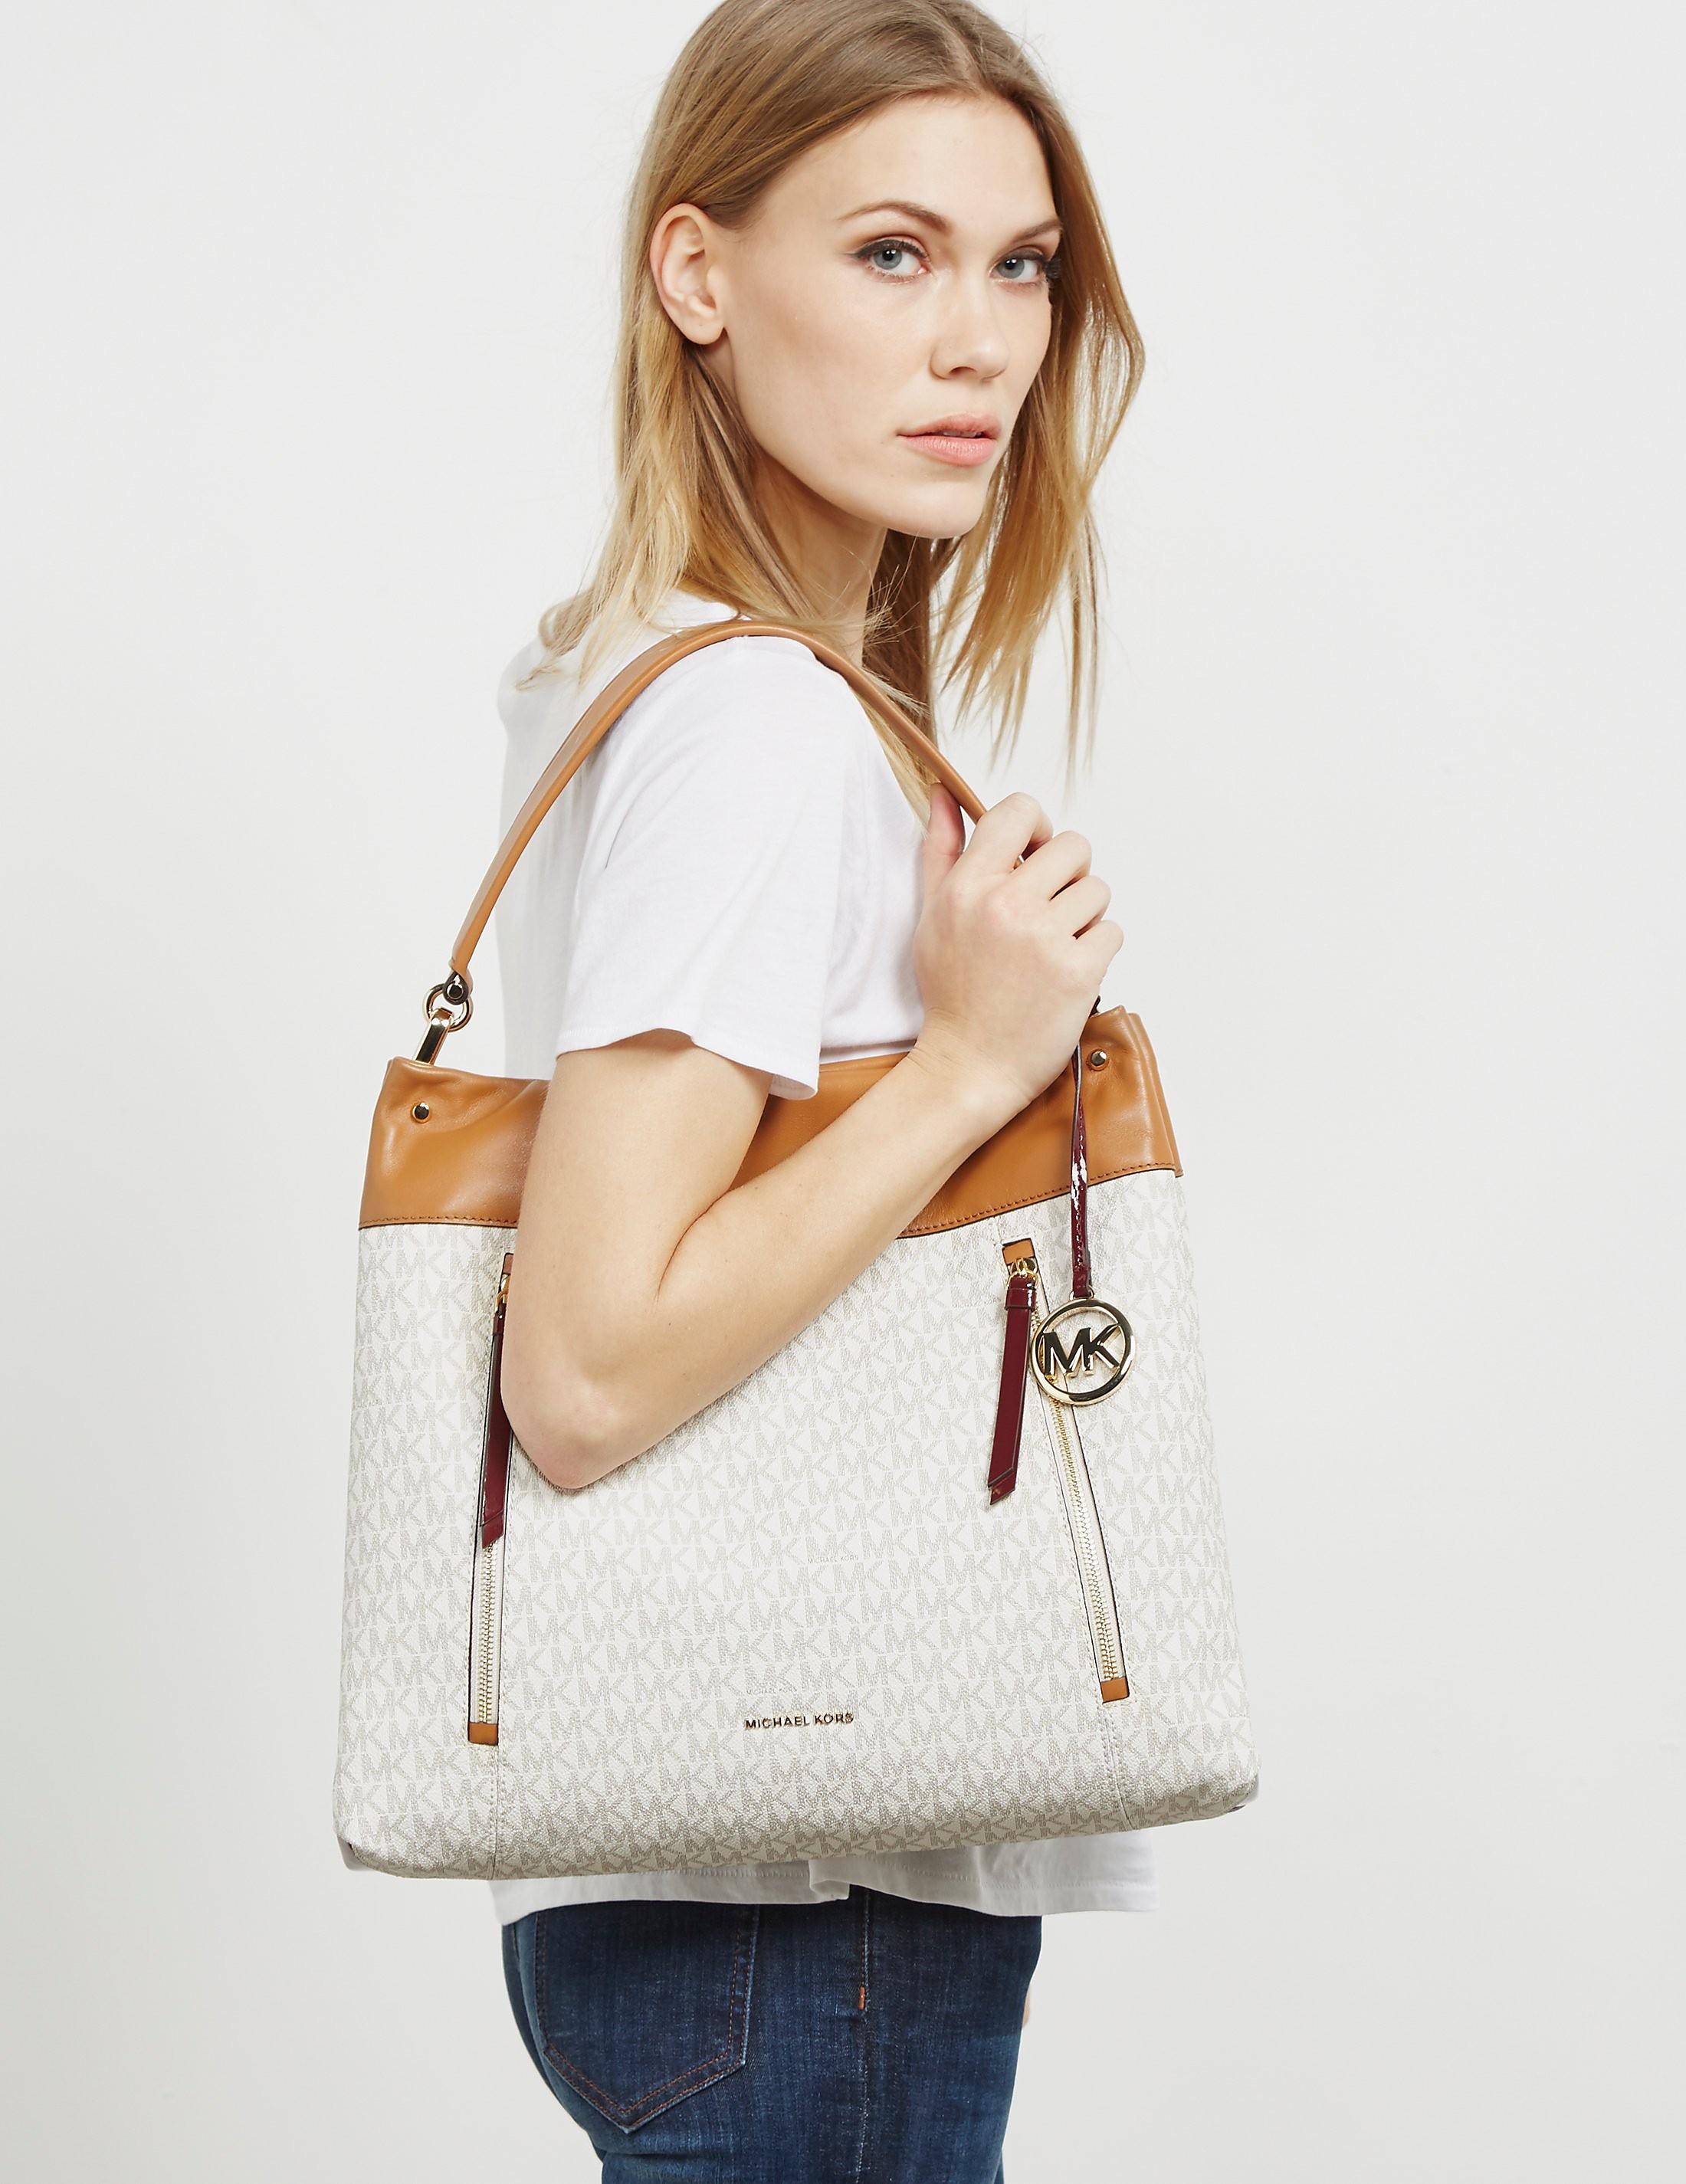 Michael Kors Lex Hobo Shopper Bag - Online Exclusive